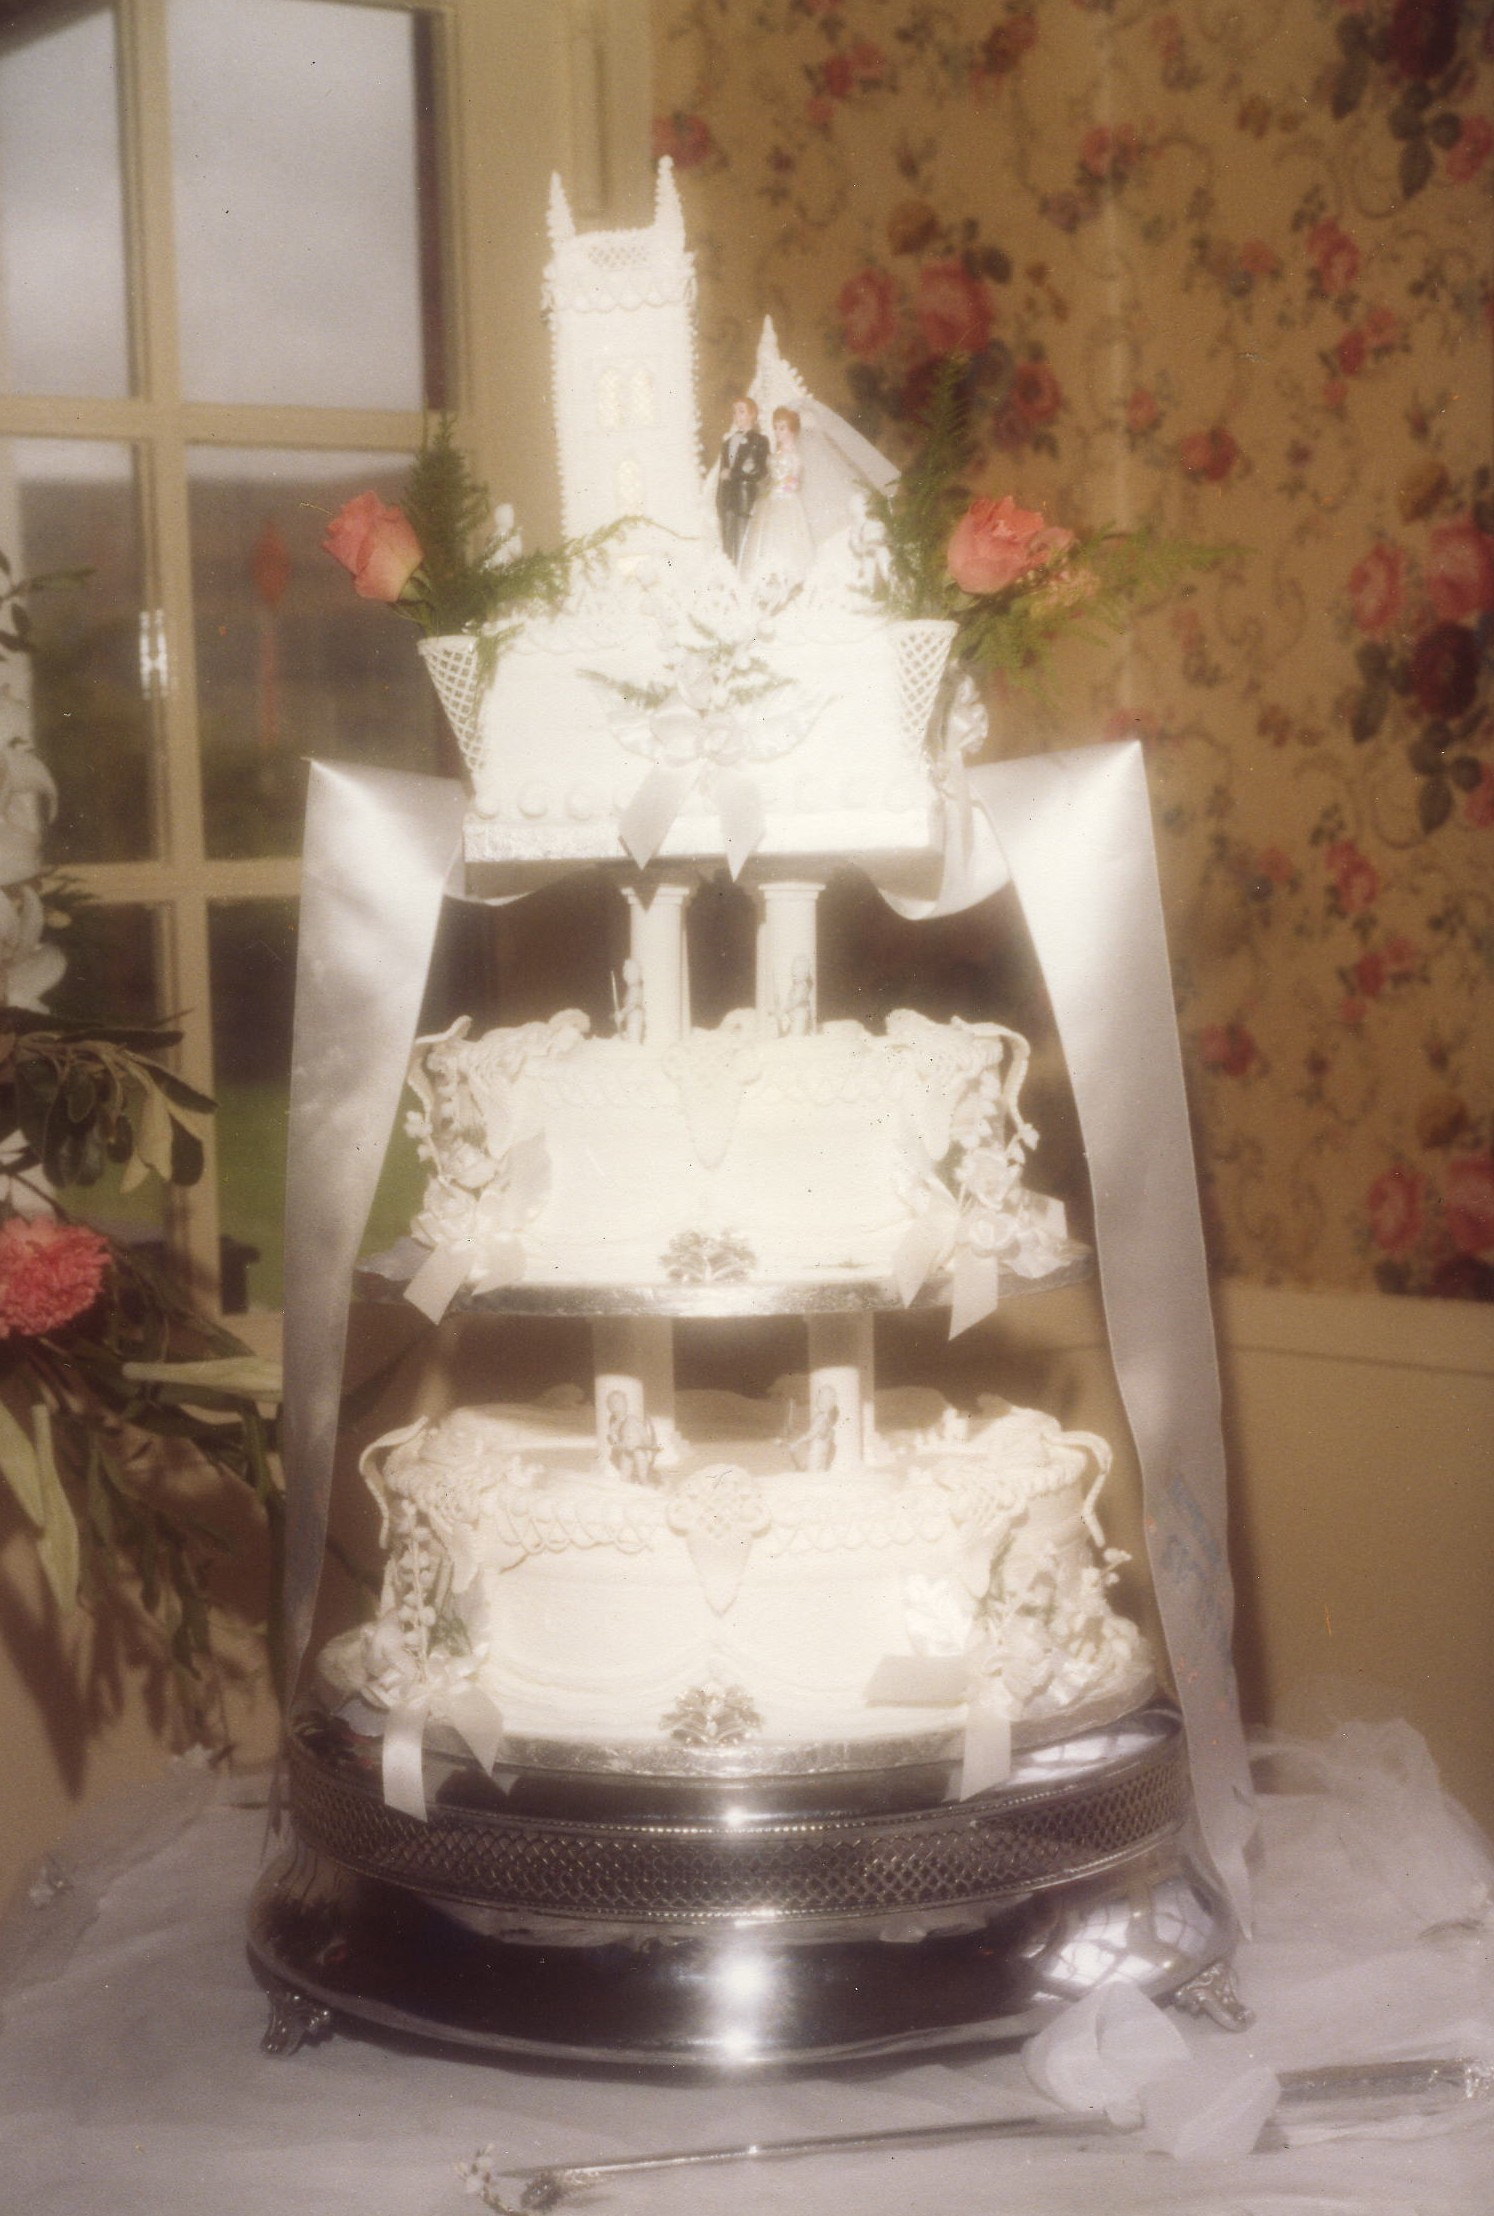 Dougie Fraser & Cathy Wade's Wedding